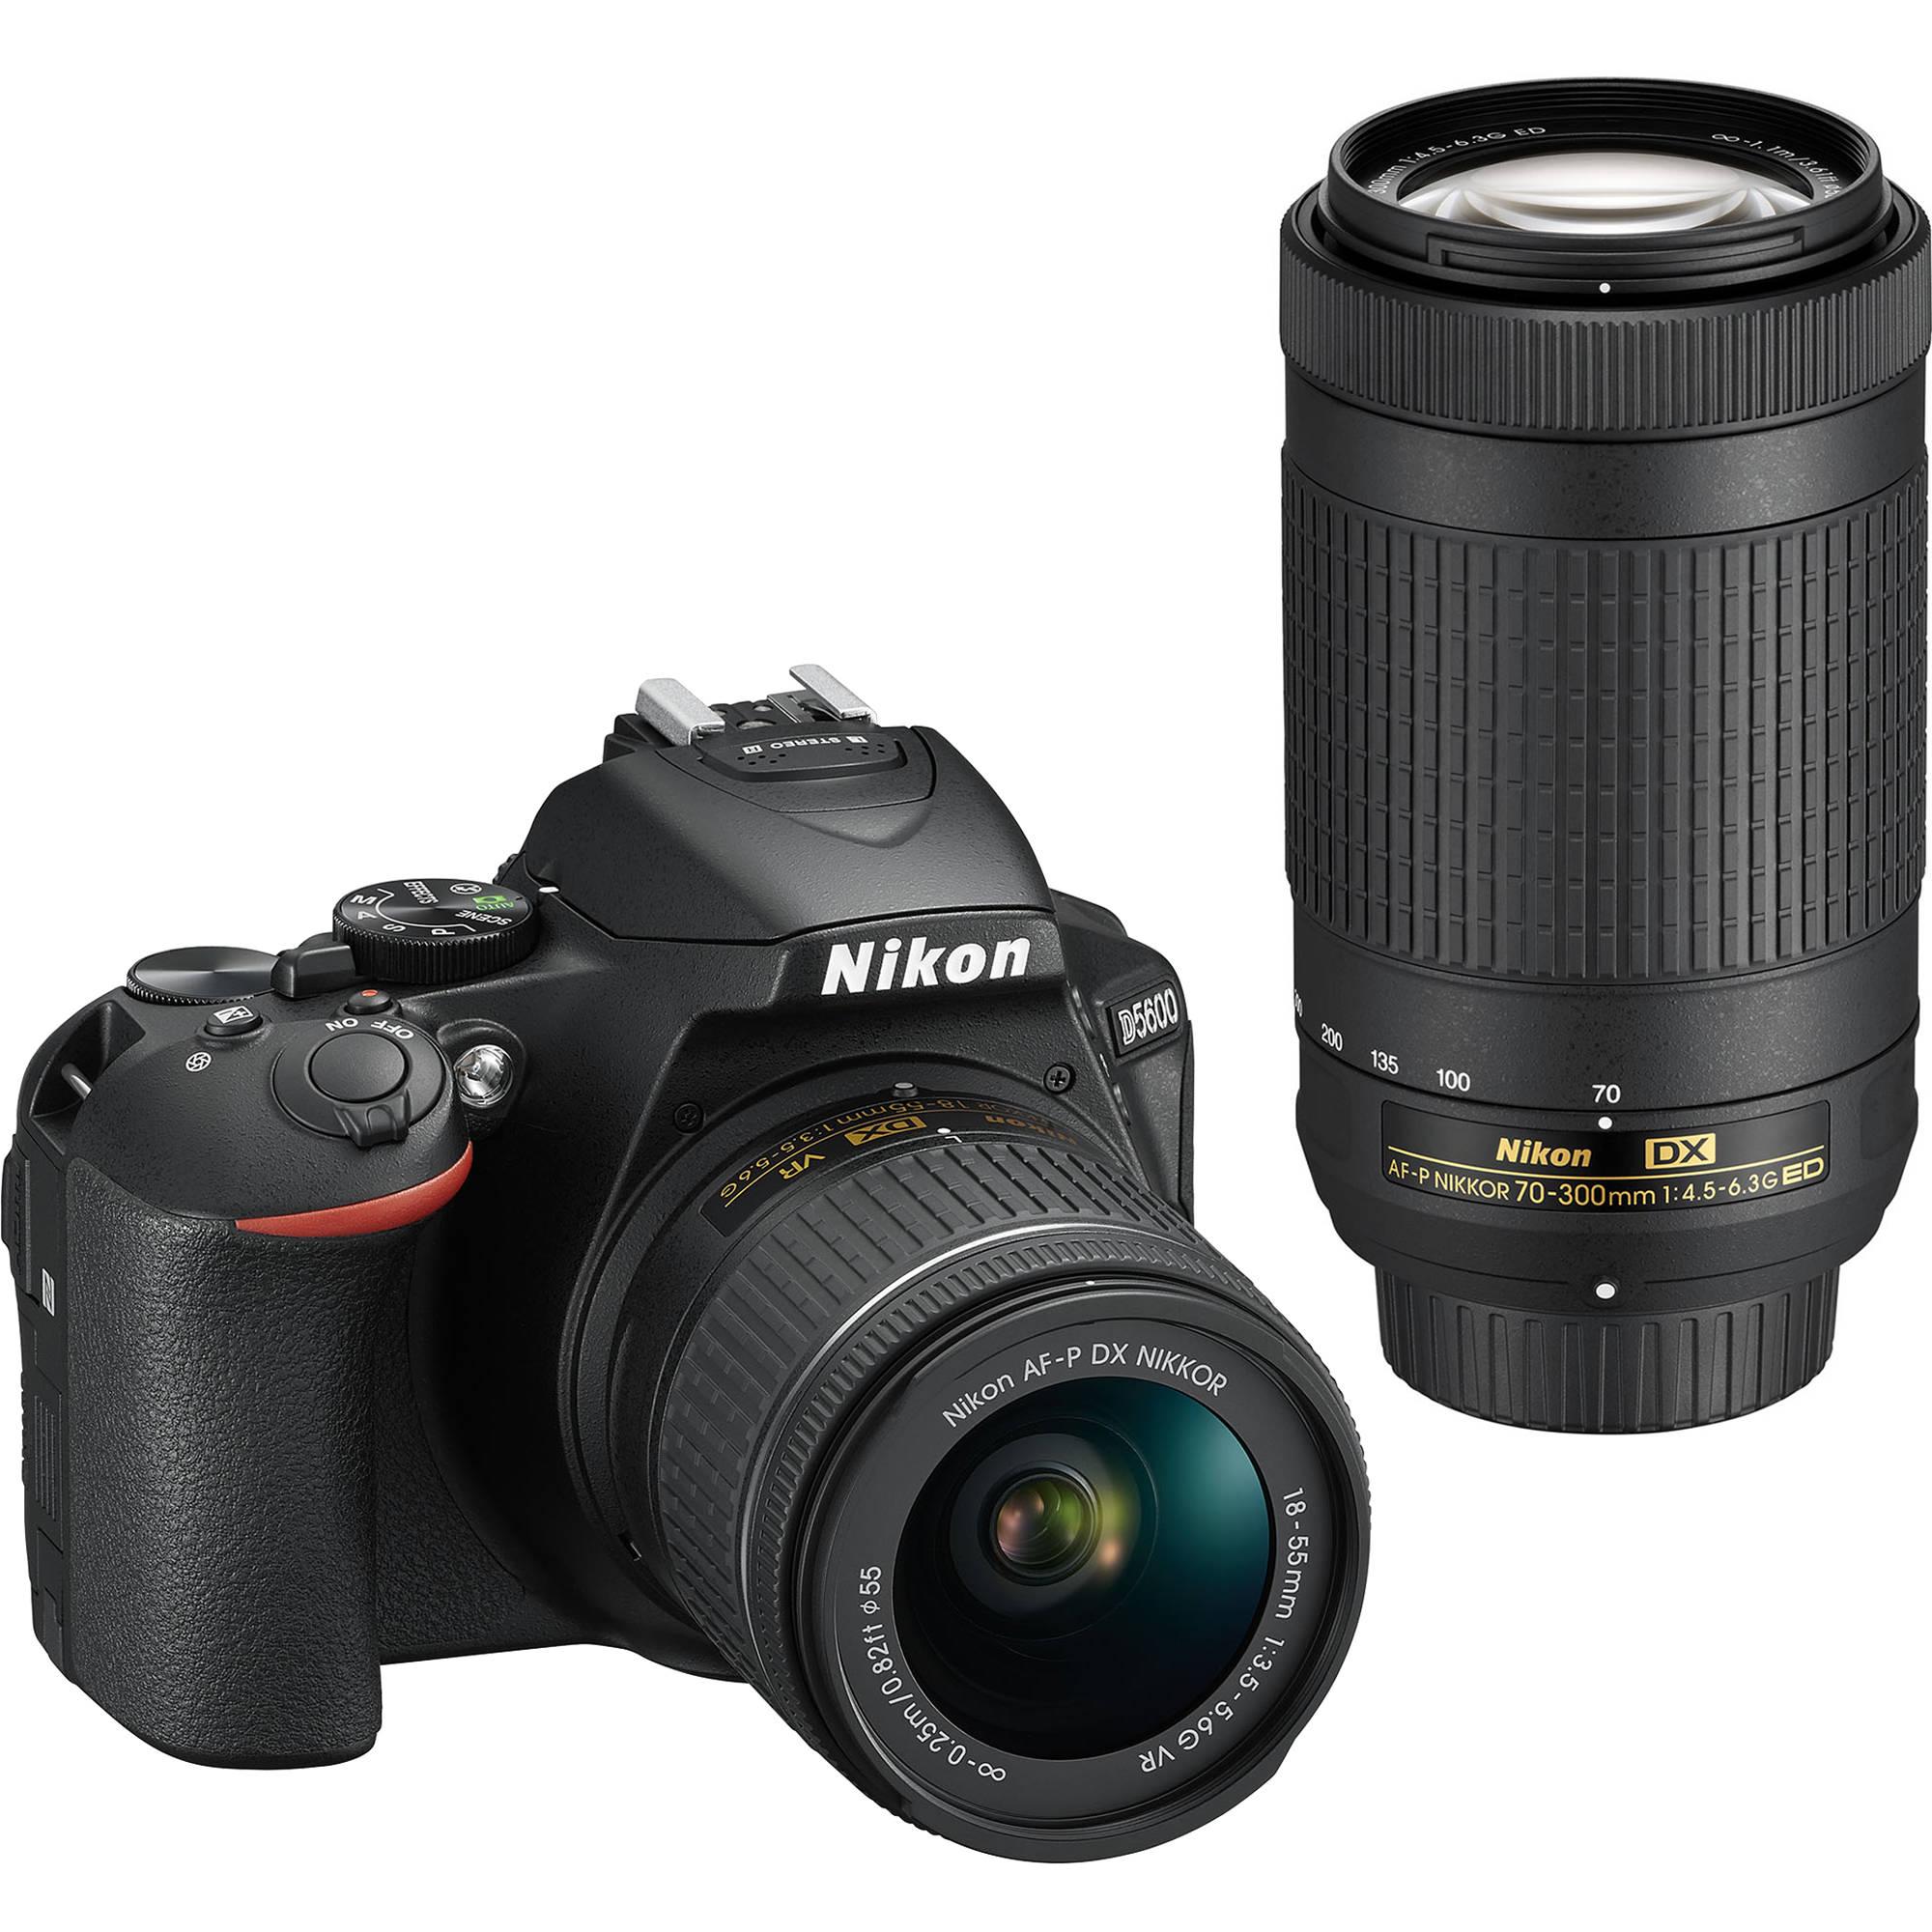 Nikon D5600 DSLR Camera Kit w/AFP DX 18-55mm f/3.5-5.6G VR AFP DX 70-300/4.5-6.3G Lenses Bundle $796.95, Nikon D750 FX-Format Digital SLR Body Only Camera Bundle w/ Free Grip $1497